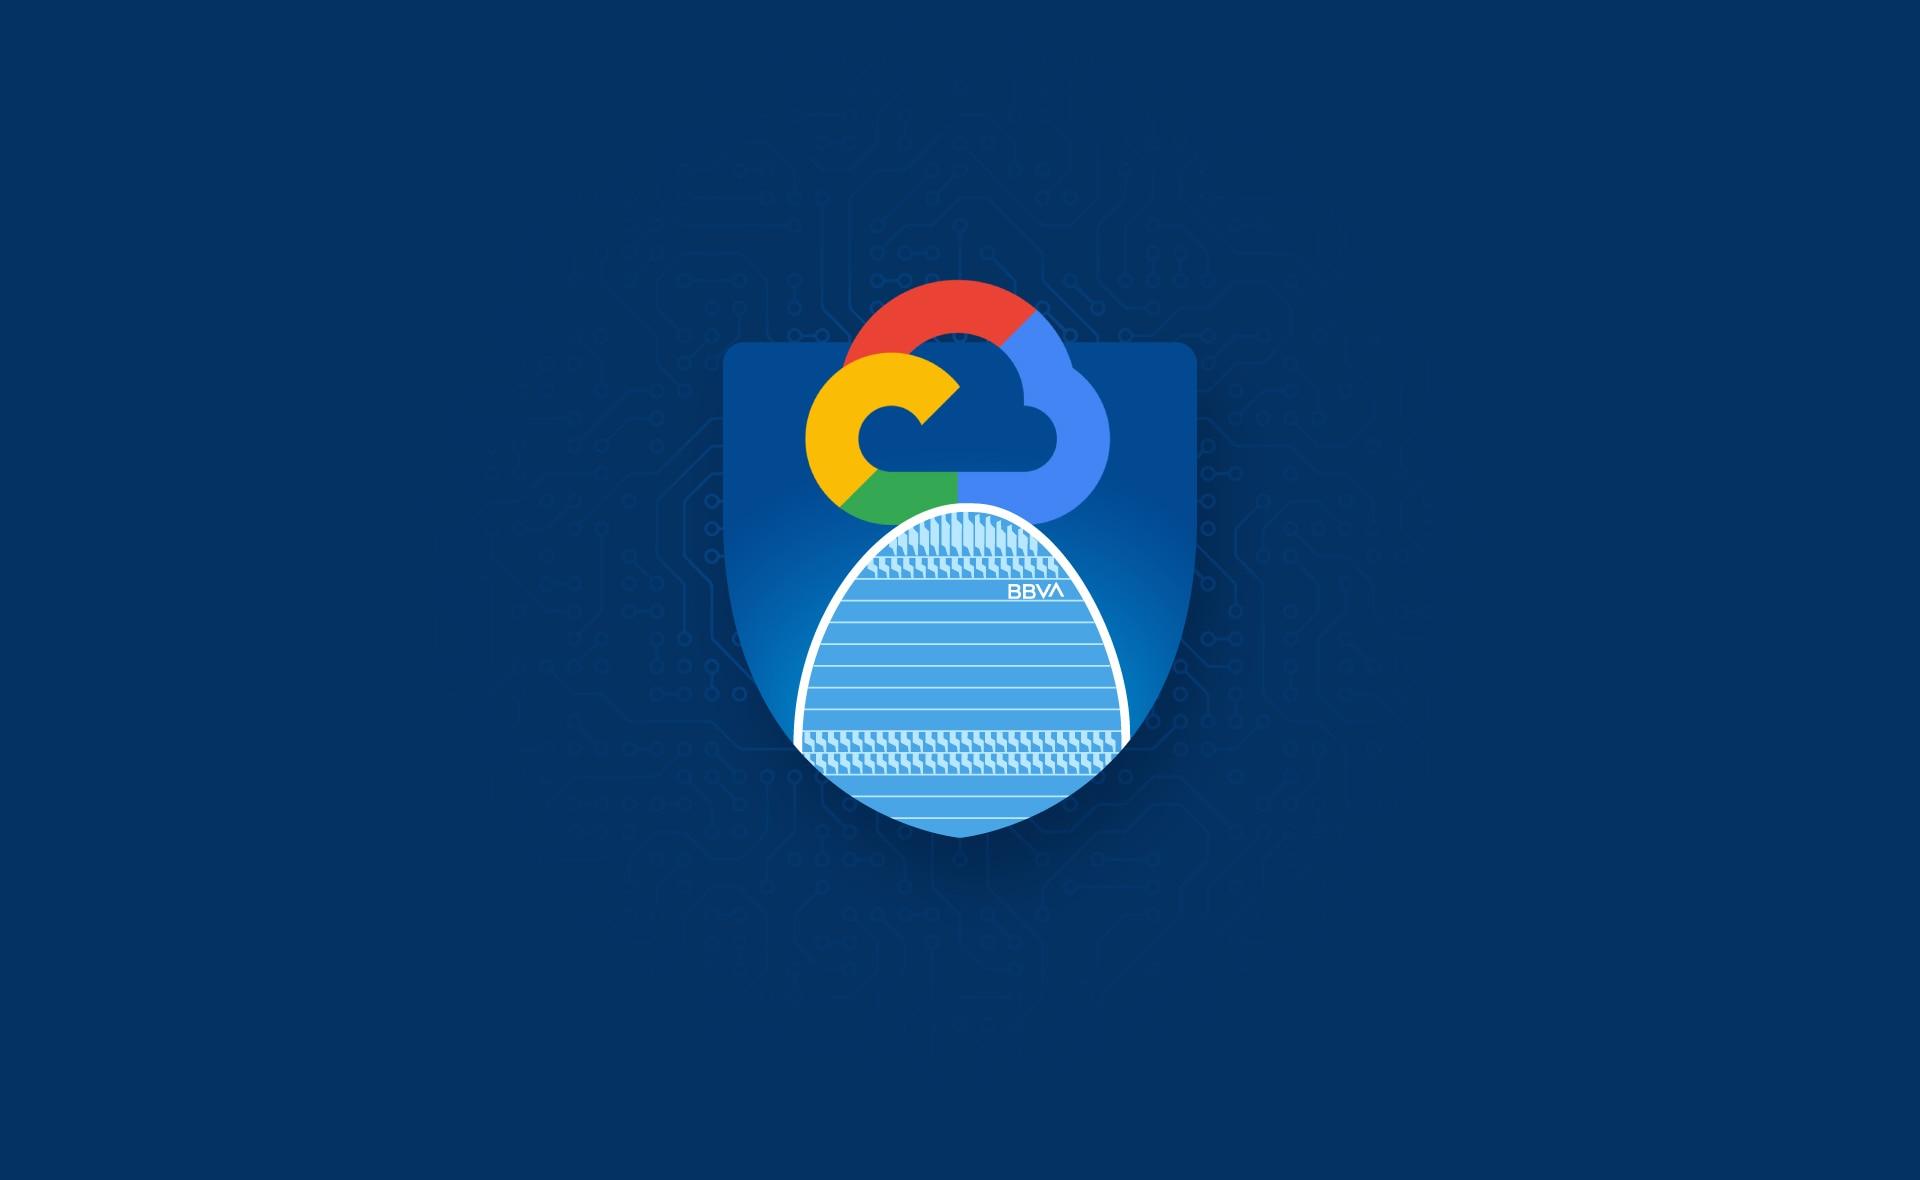 google_security_cloud-bbva-ilustracion